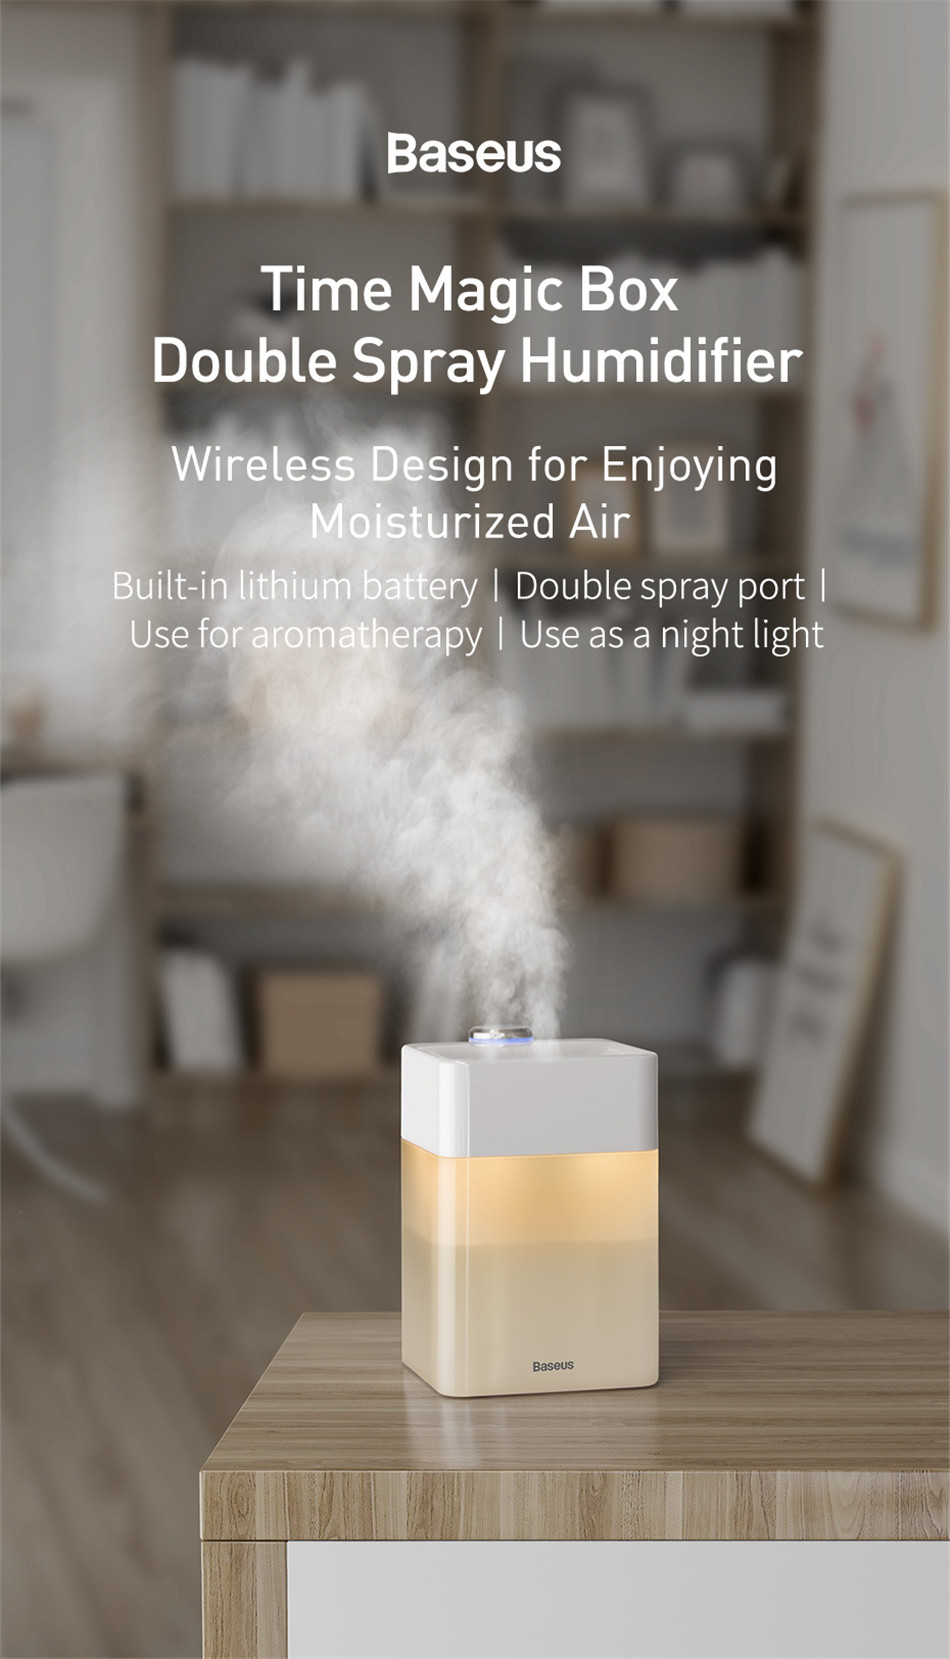 Baseus Time Magic Box Dual Spray Humidifier 4